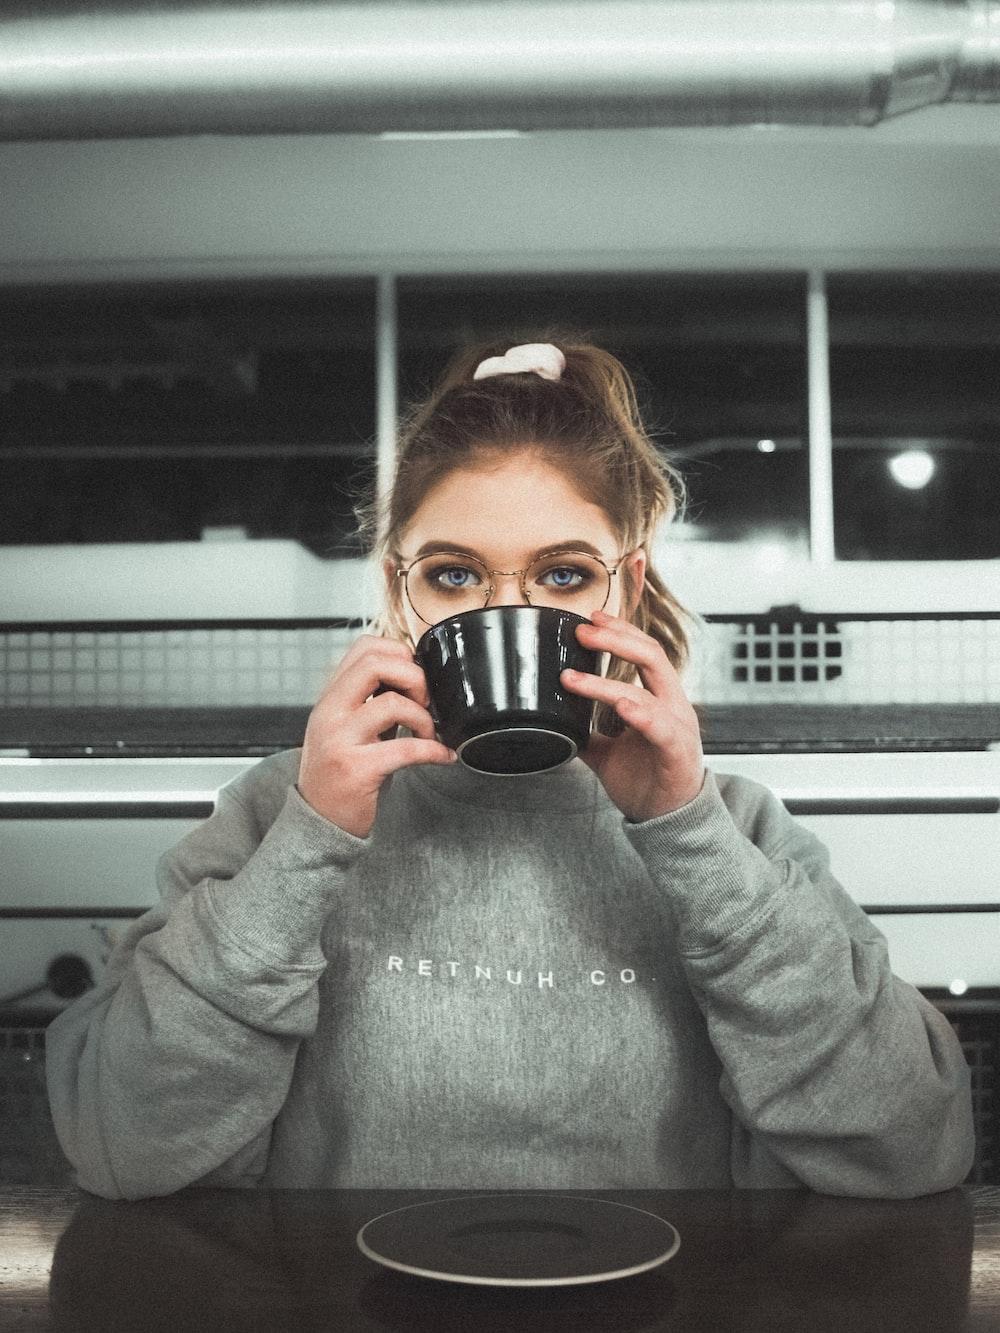 woman wearing glasses holding black ceramic mug